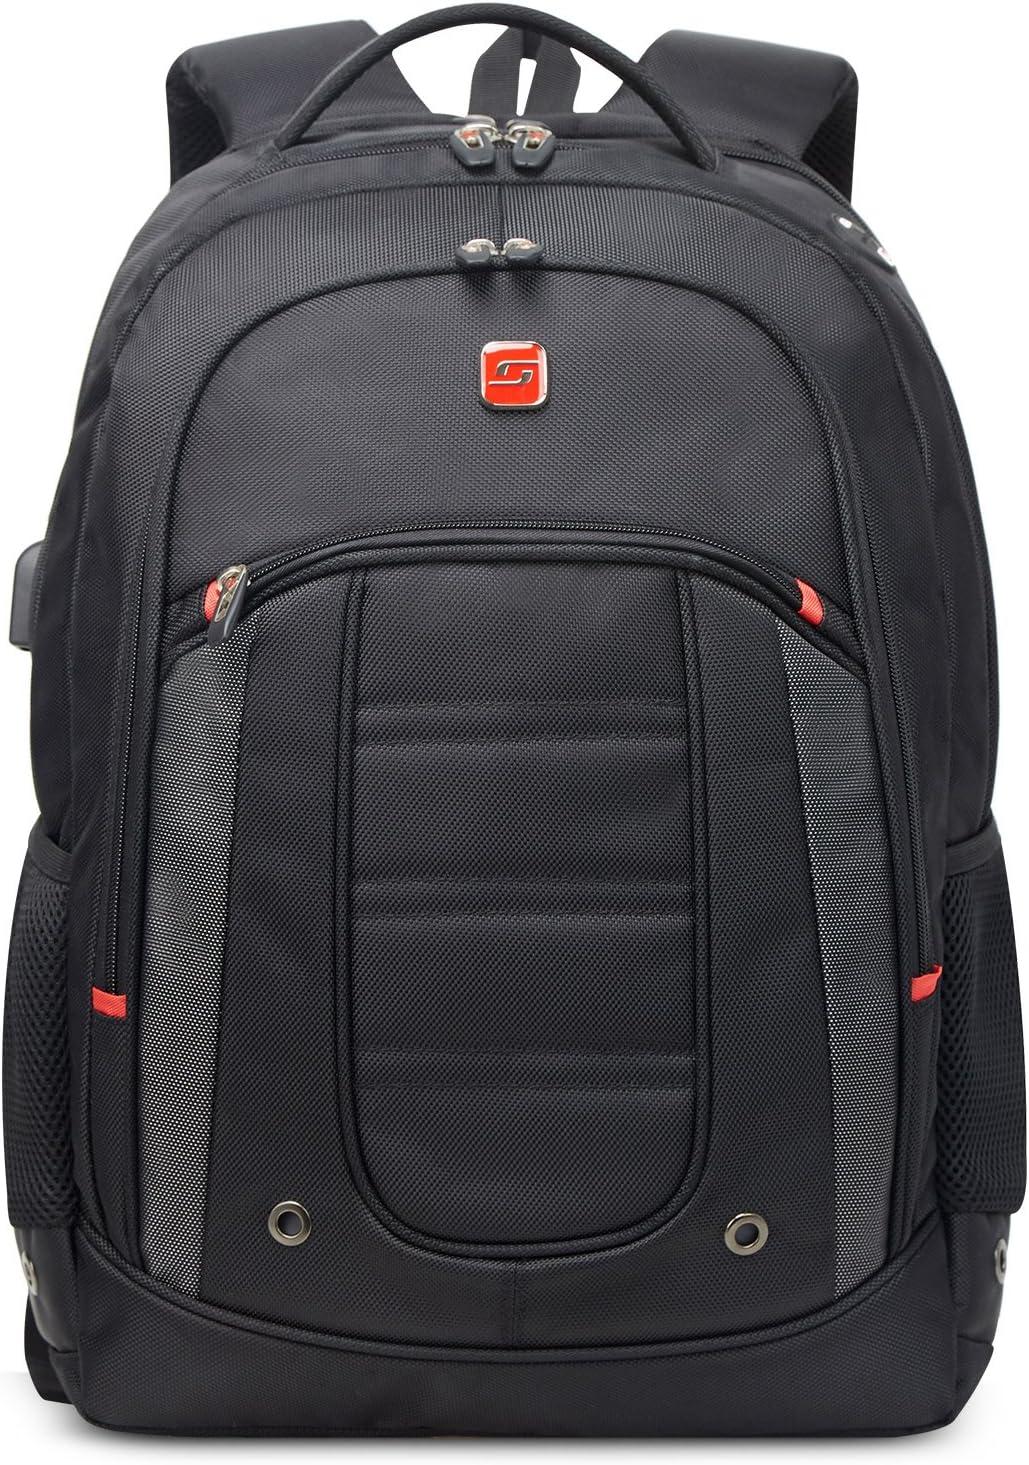 Soarpop BB4341XL Scansmart Mochila para Ordenador portátil 17,3